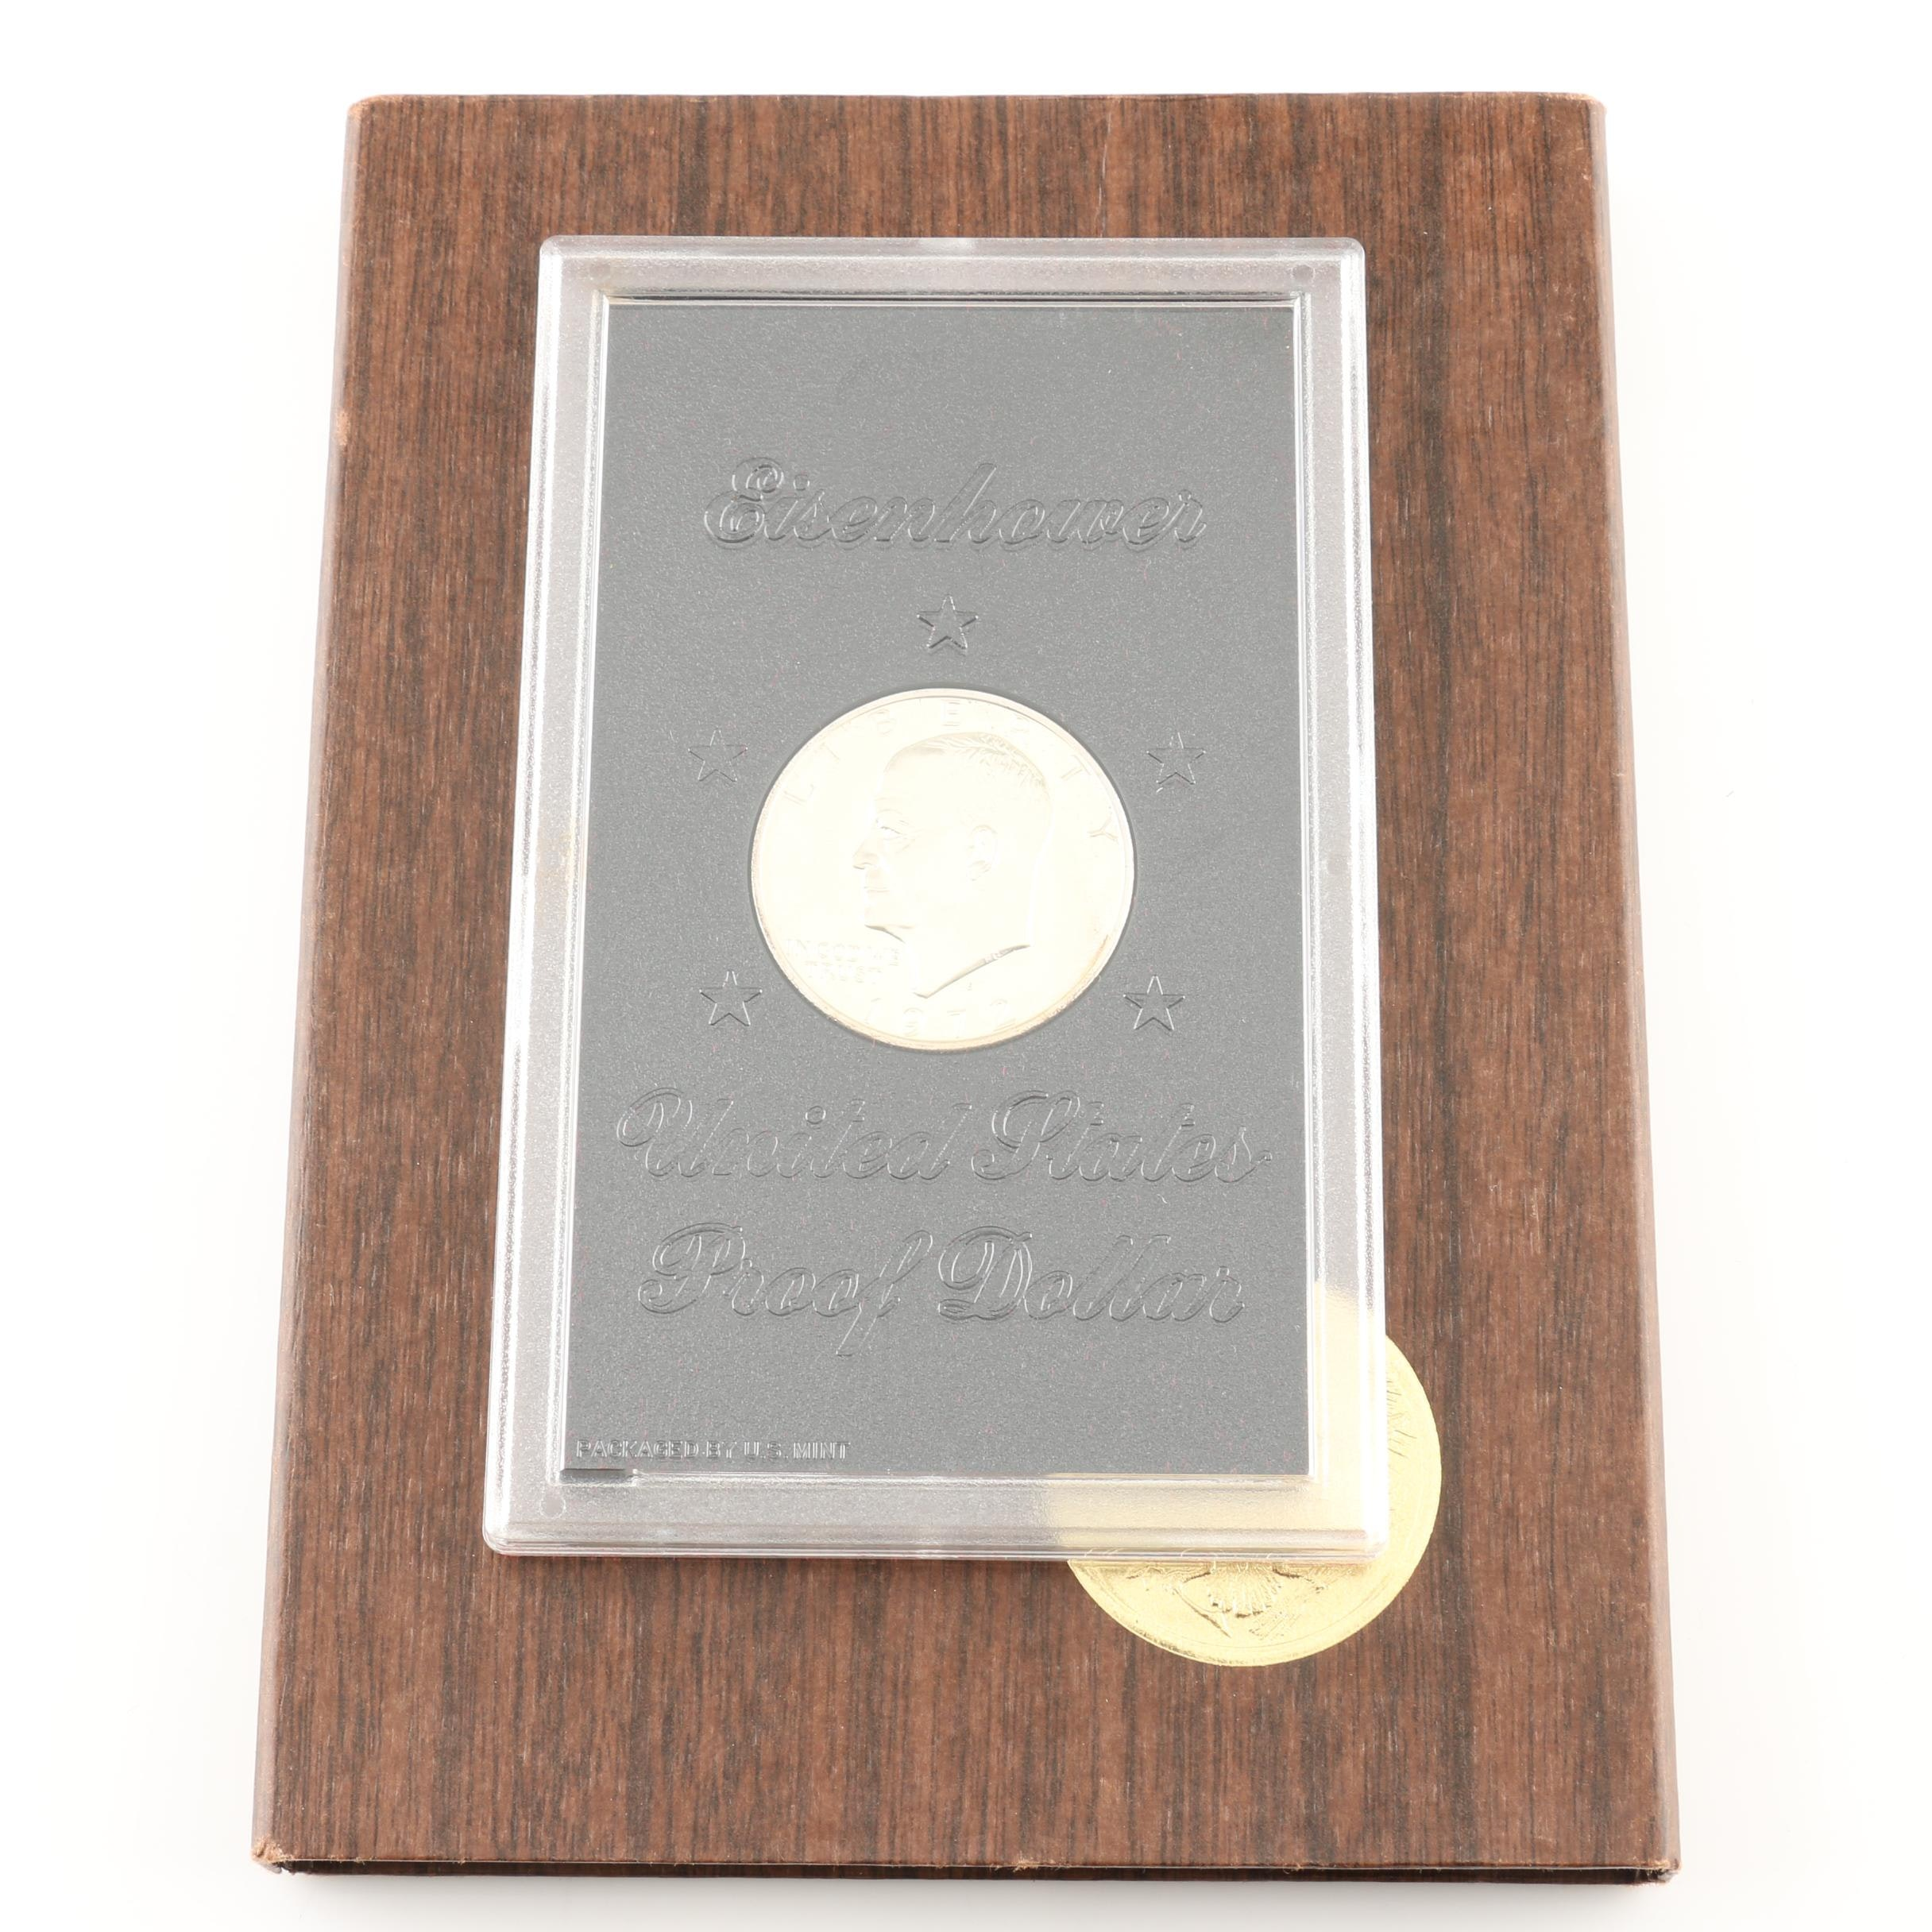 1972-S Eisenhower Proof Silver Dollar